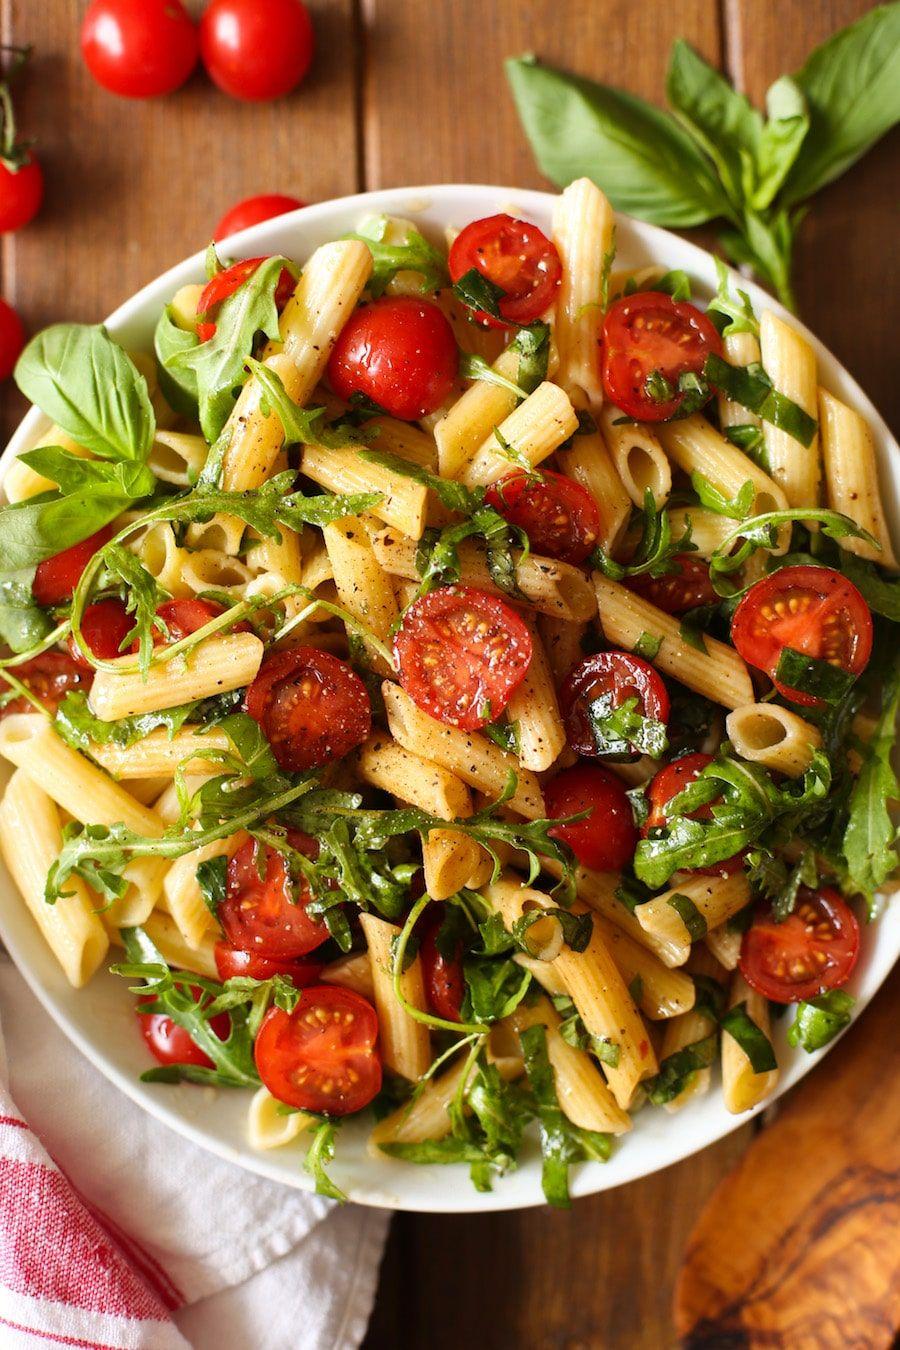 Tomato Arugula Balsamic Pasta Salad